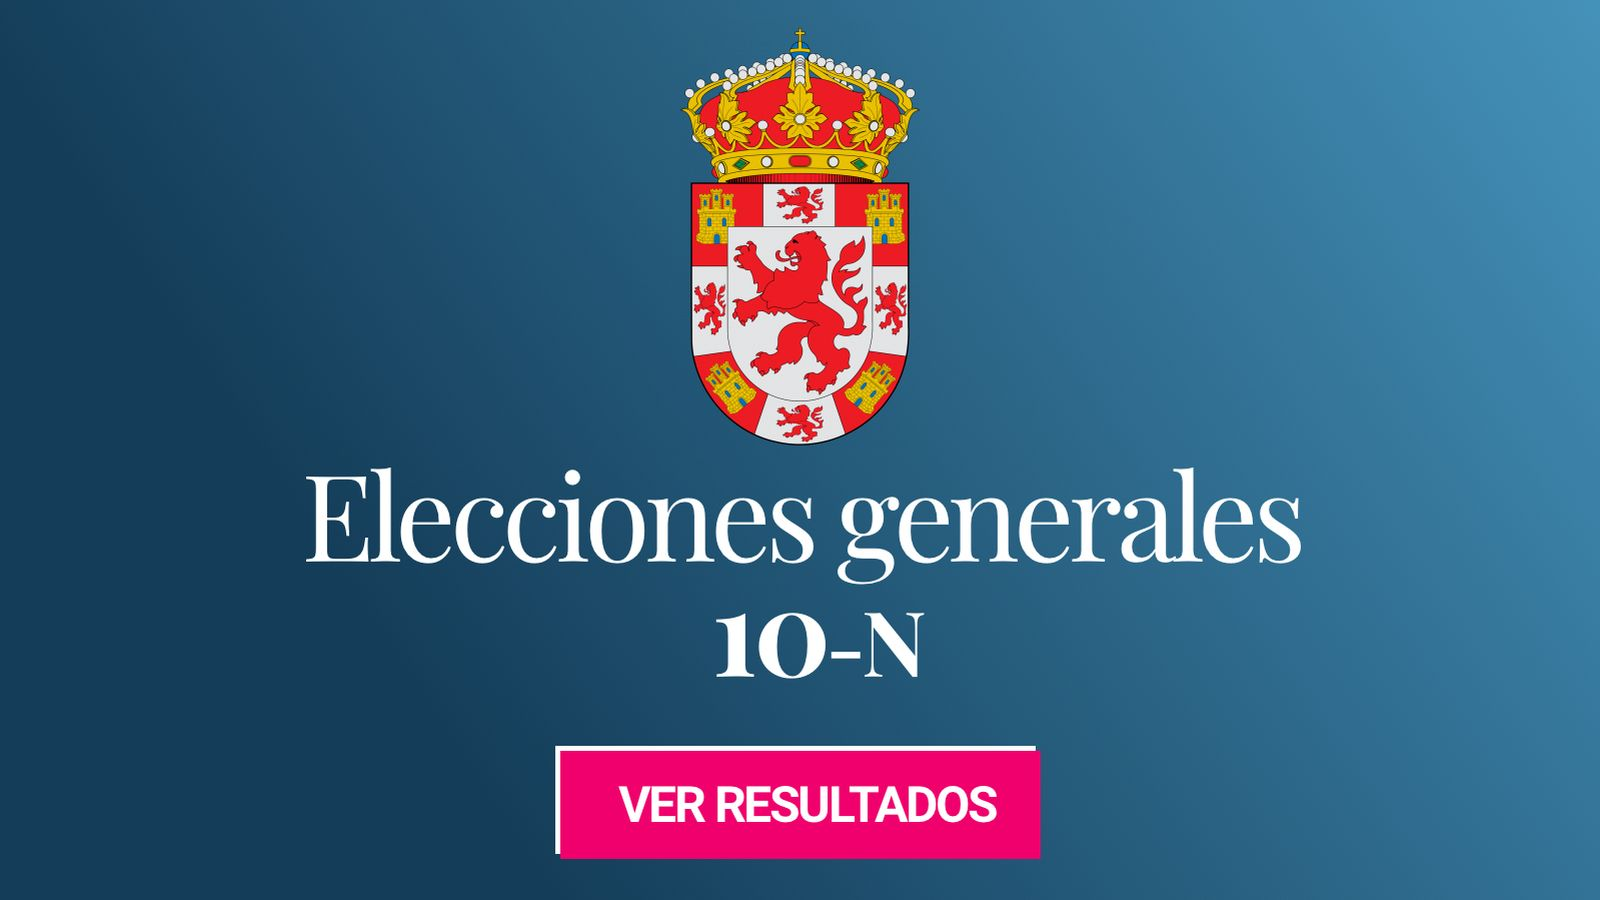 Foto: Elecciones generales 2019 en la provincia de Córdoba. (C.C./HansenBCN)